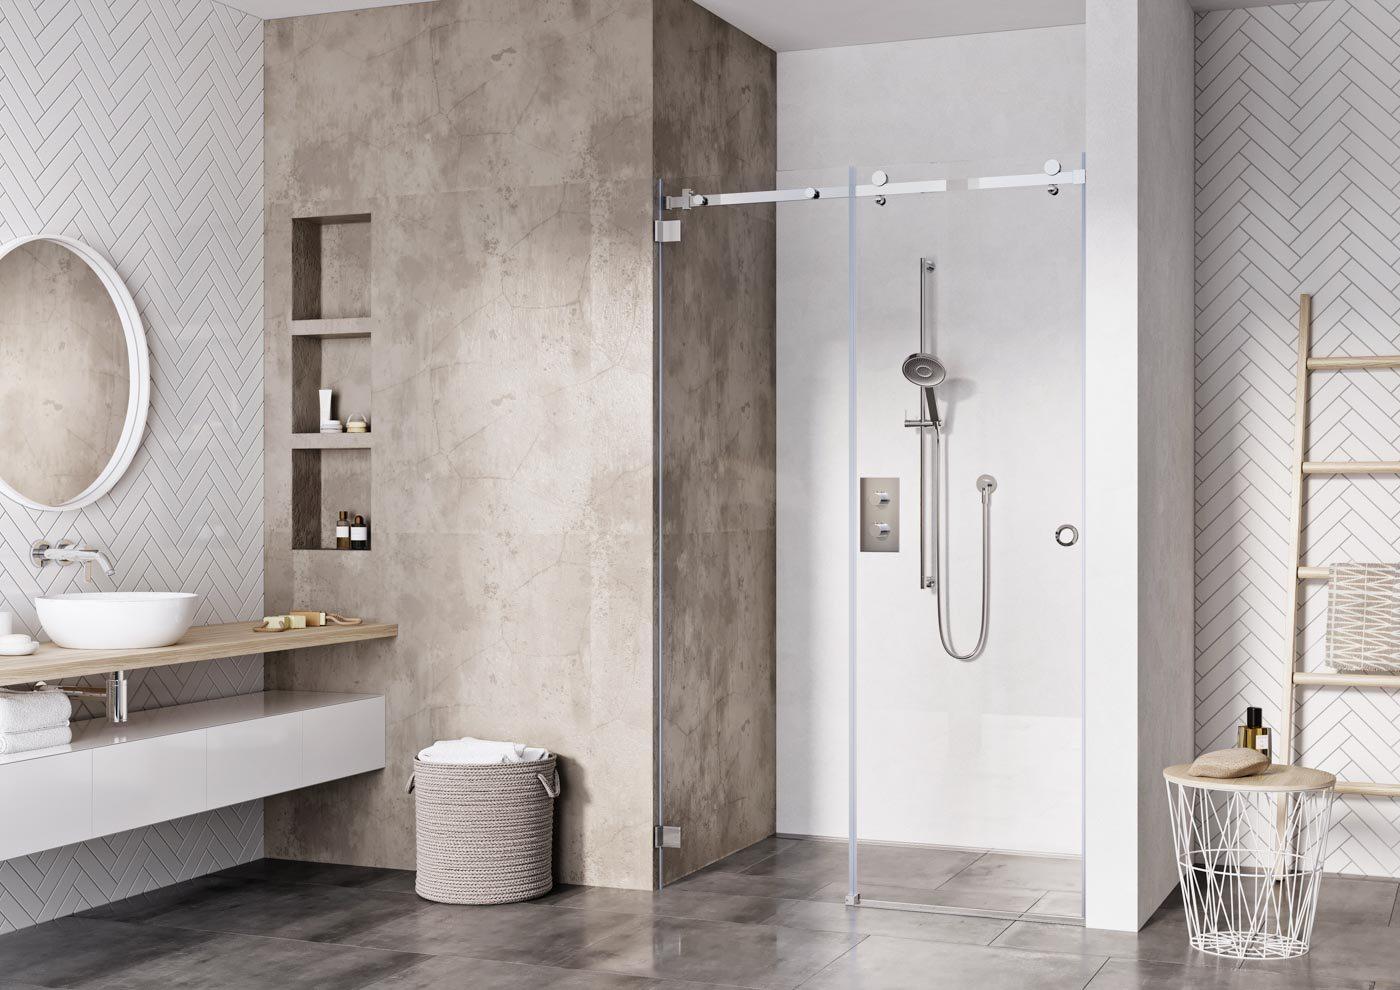 Kabina prysznicowa SLIDO marki Aquante